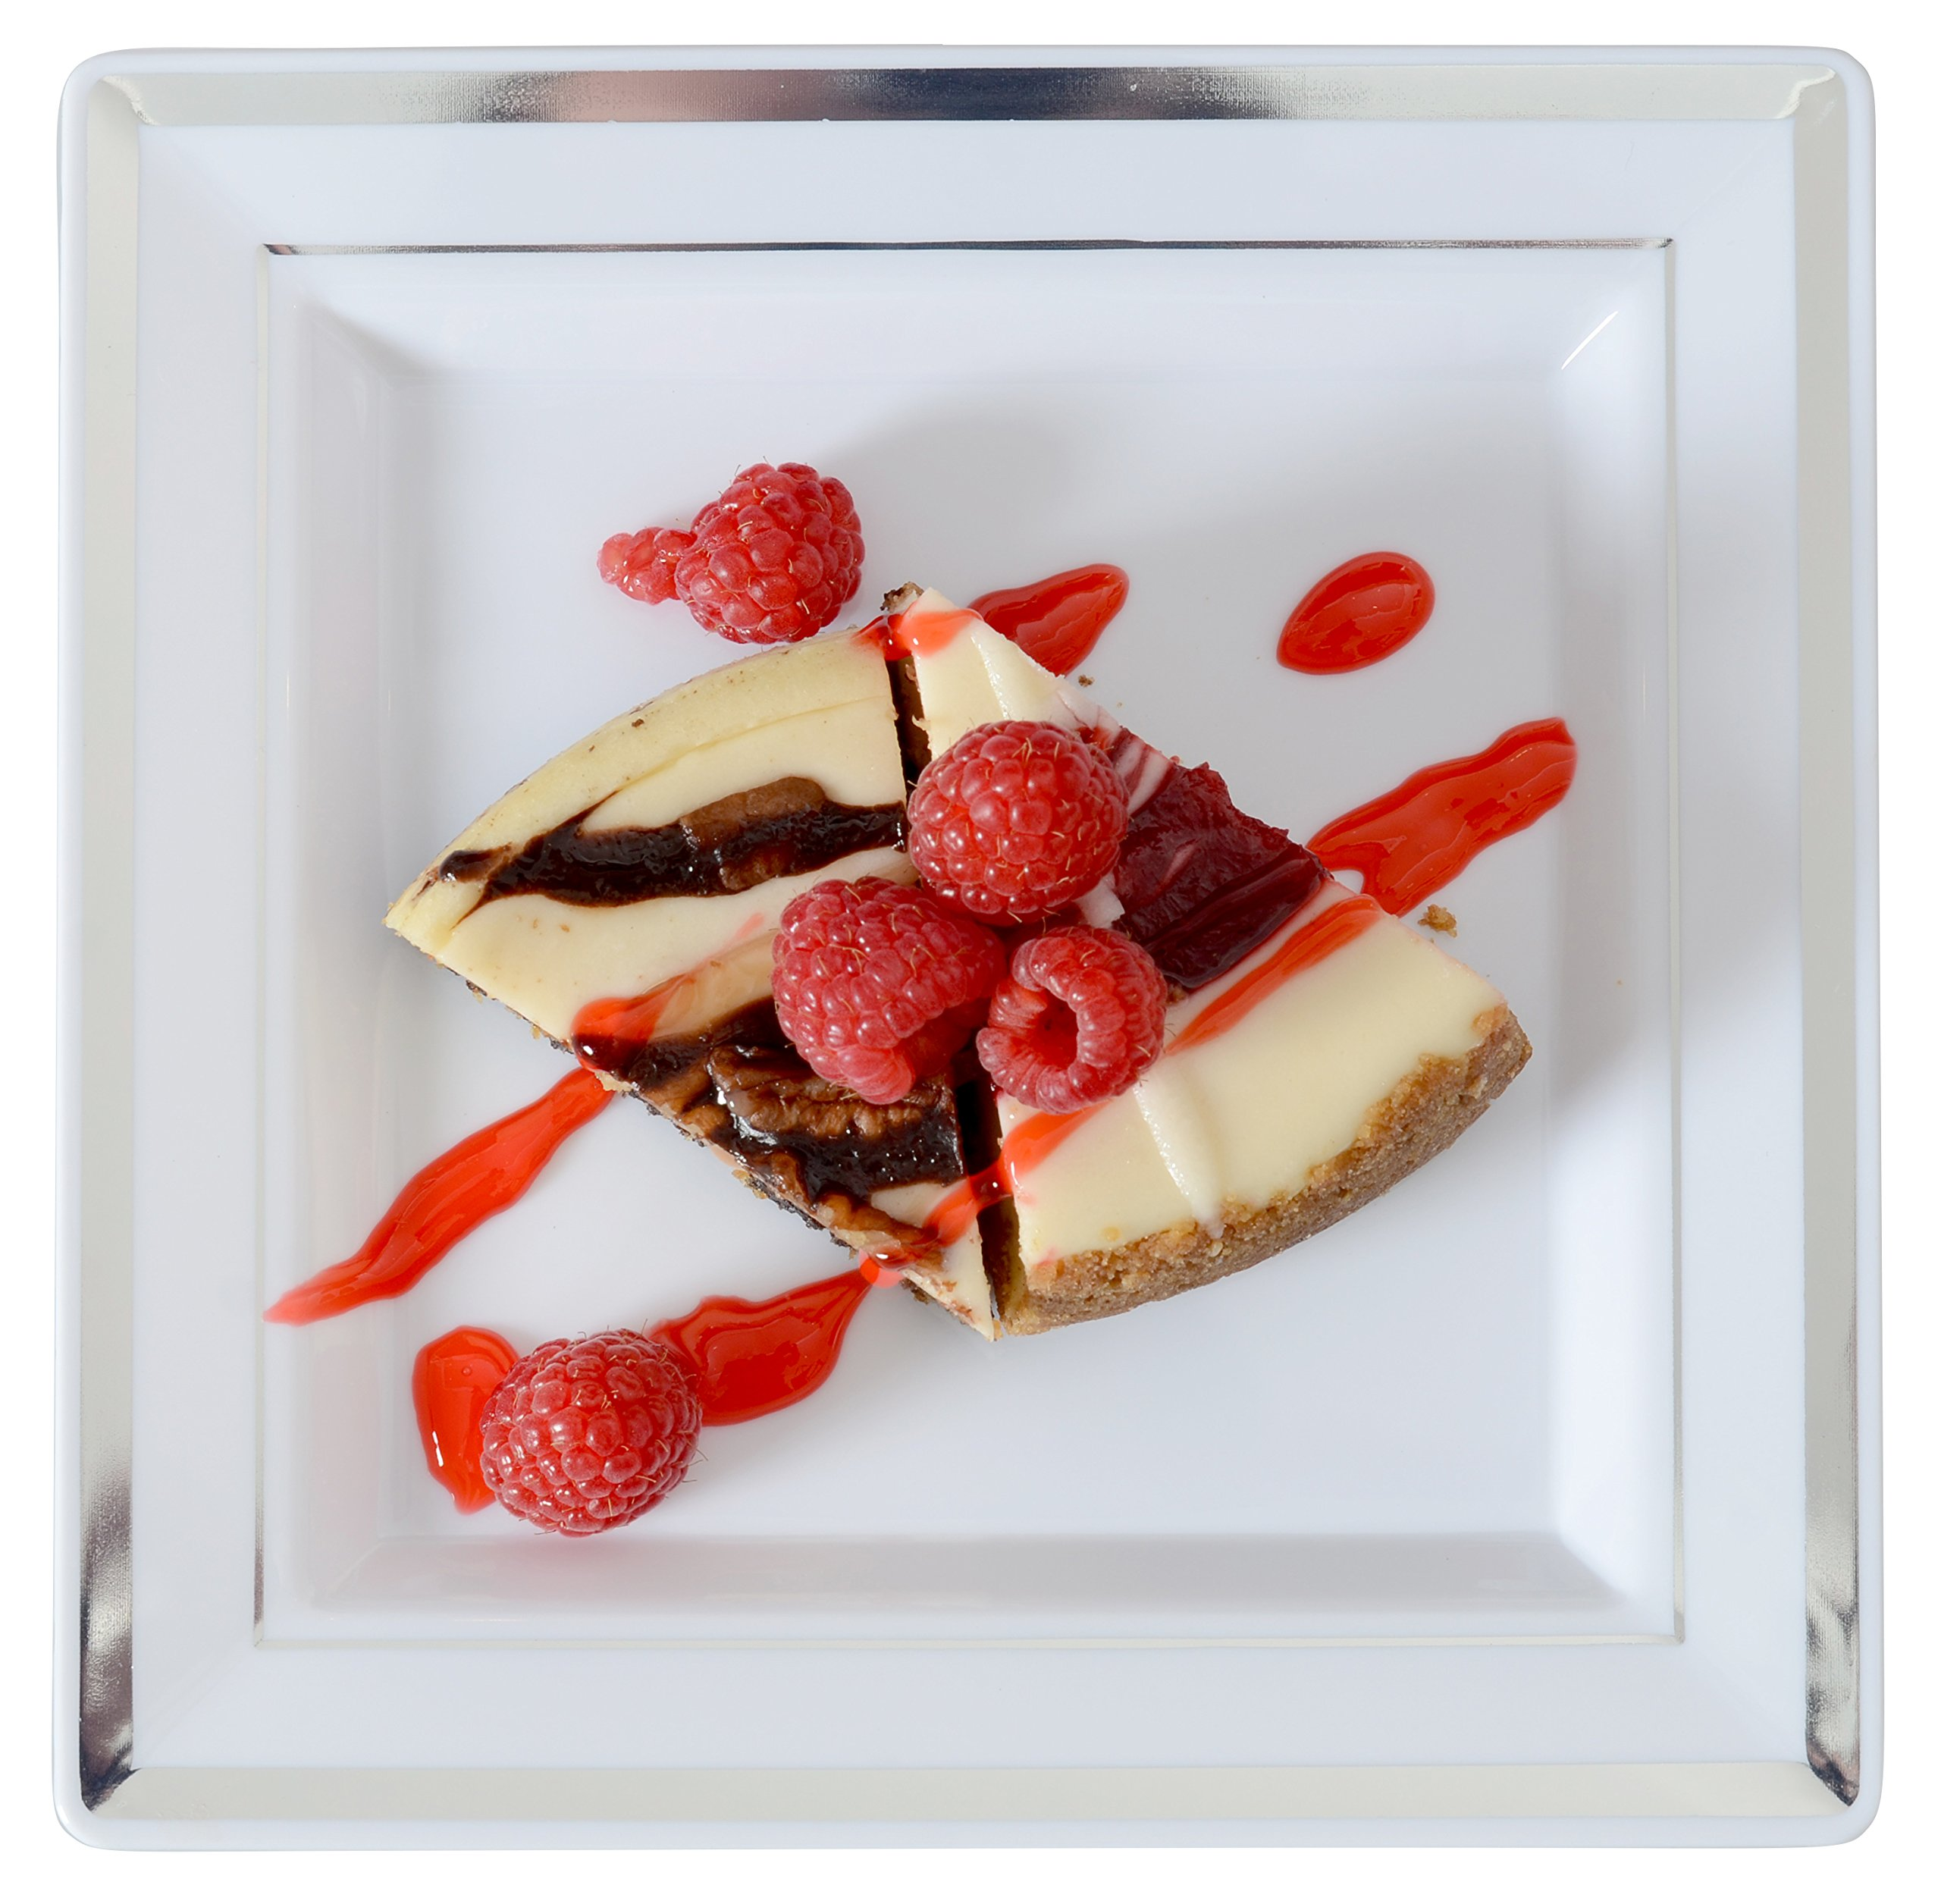 Square Splendor 5507-WH Trim Square Dessert Plate, 7.25-Inch, White and Silver, Pack of 120 by Square Splendor (Image #2)